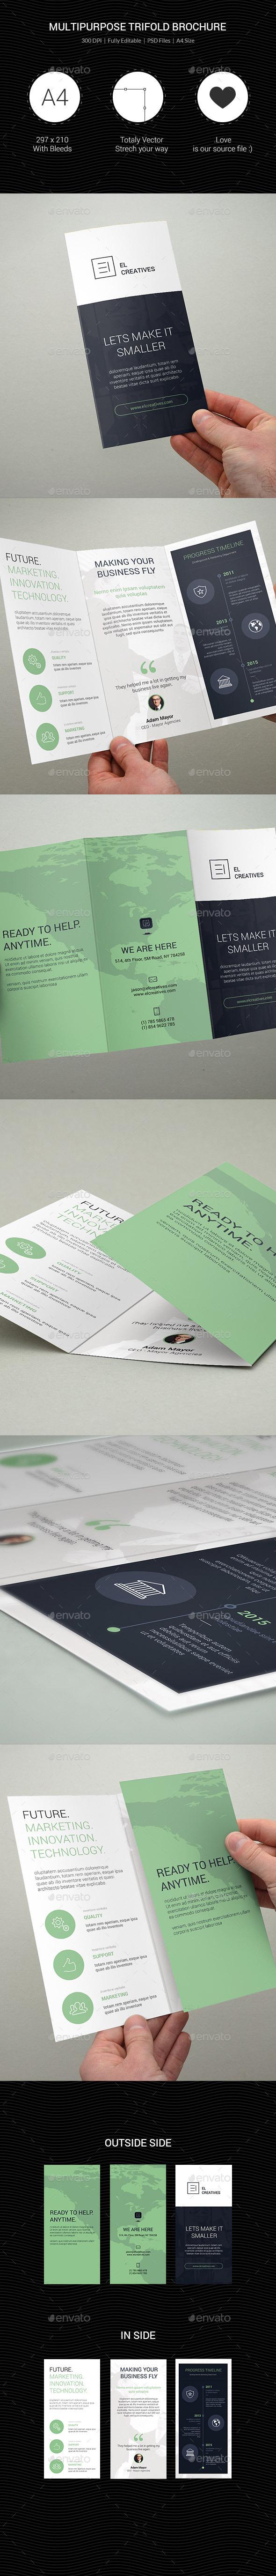 Multipurpose Creative Trifold Brochure - 07 - Corporate Brochures